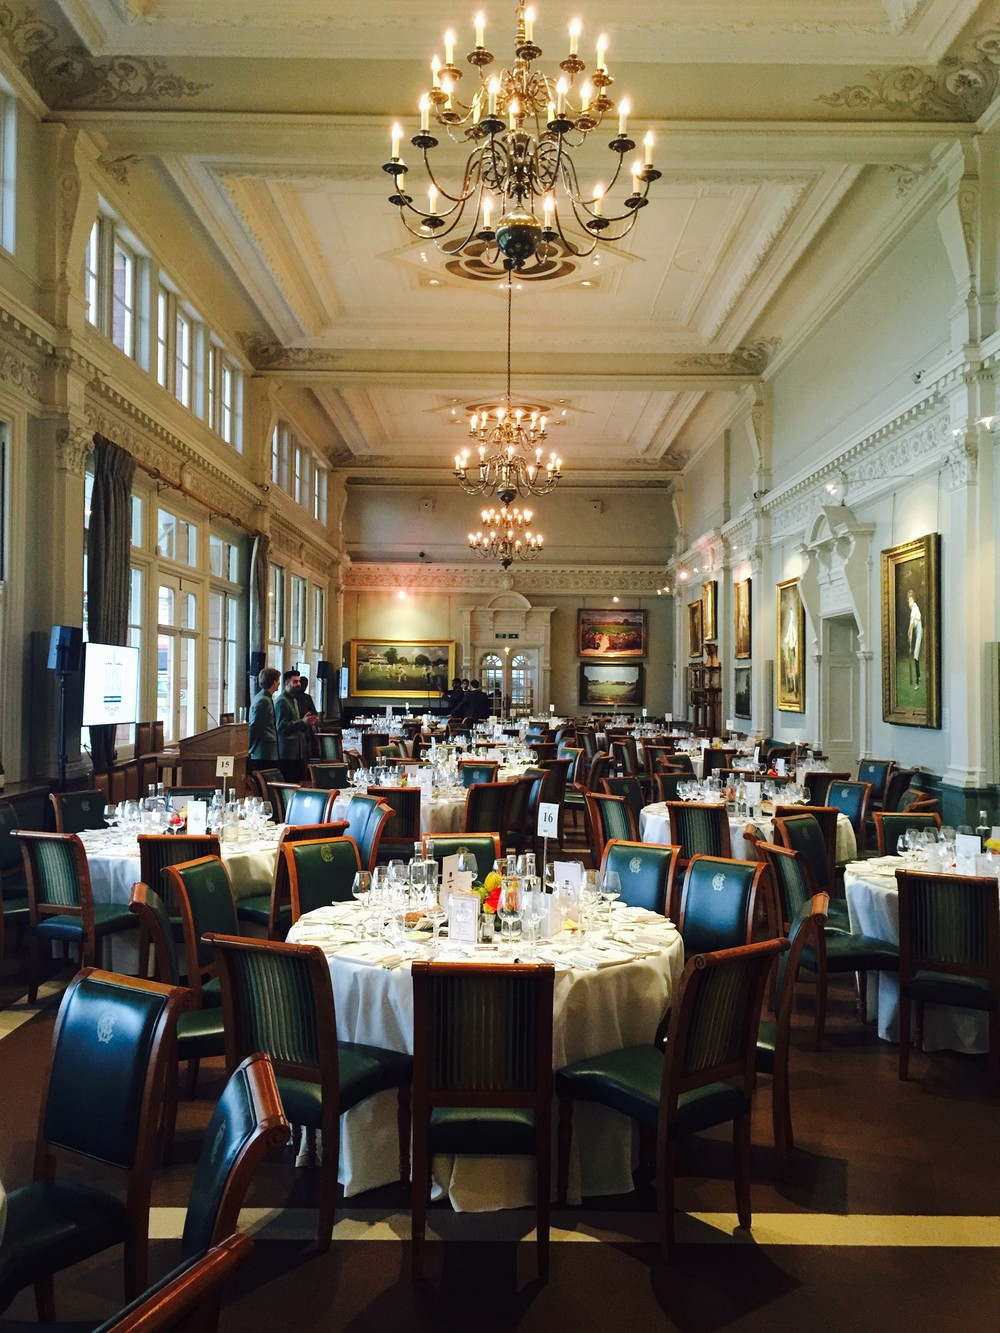 Lords-long-room-dinner-room.jpg